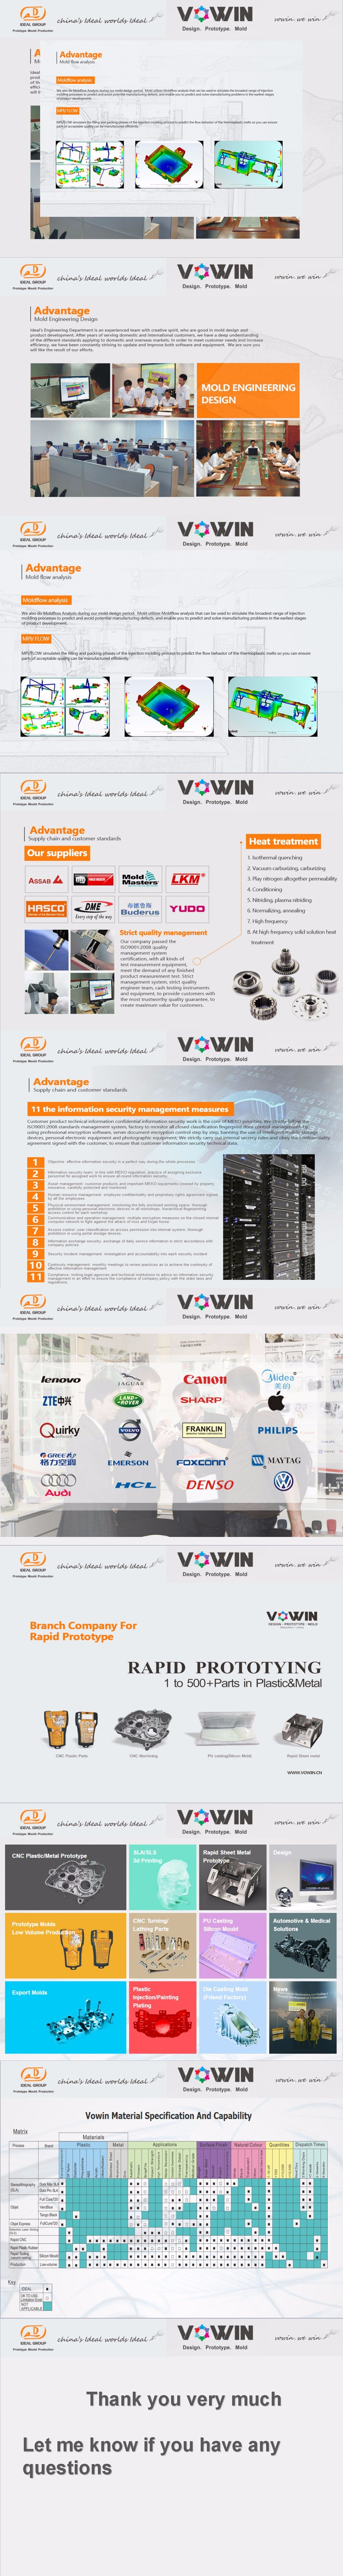 Professional Small Order Aluminium CNC Parts Rapid Prototype Manufacturer in China